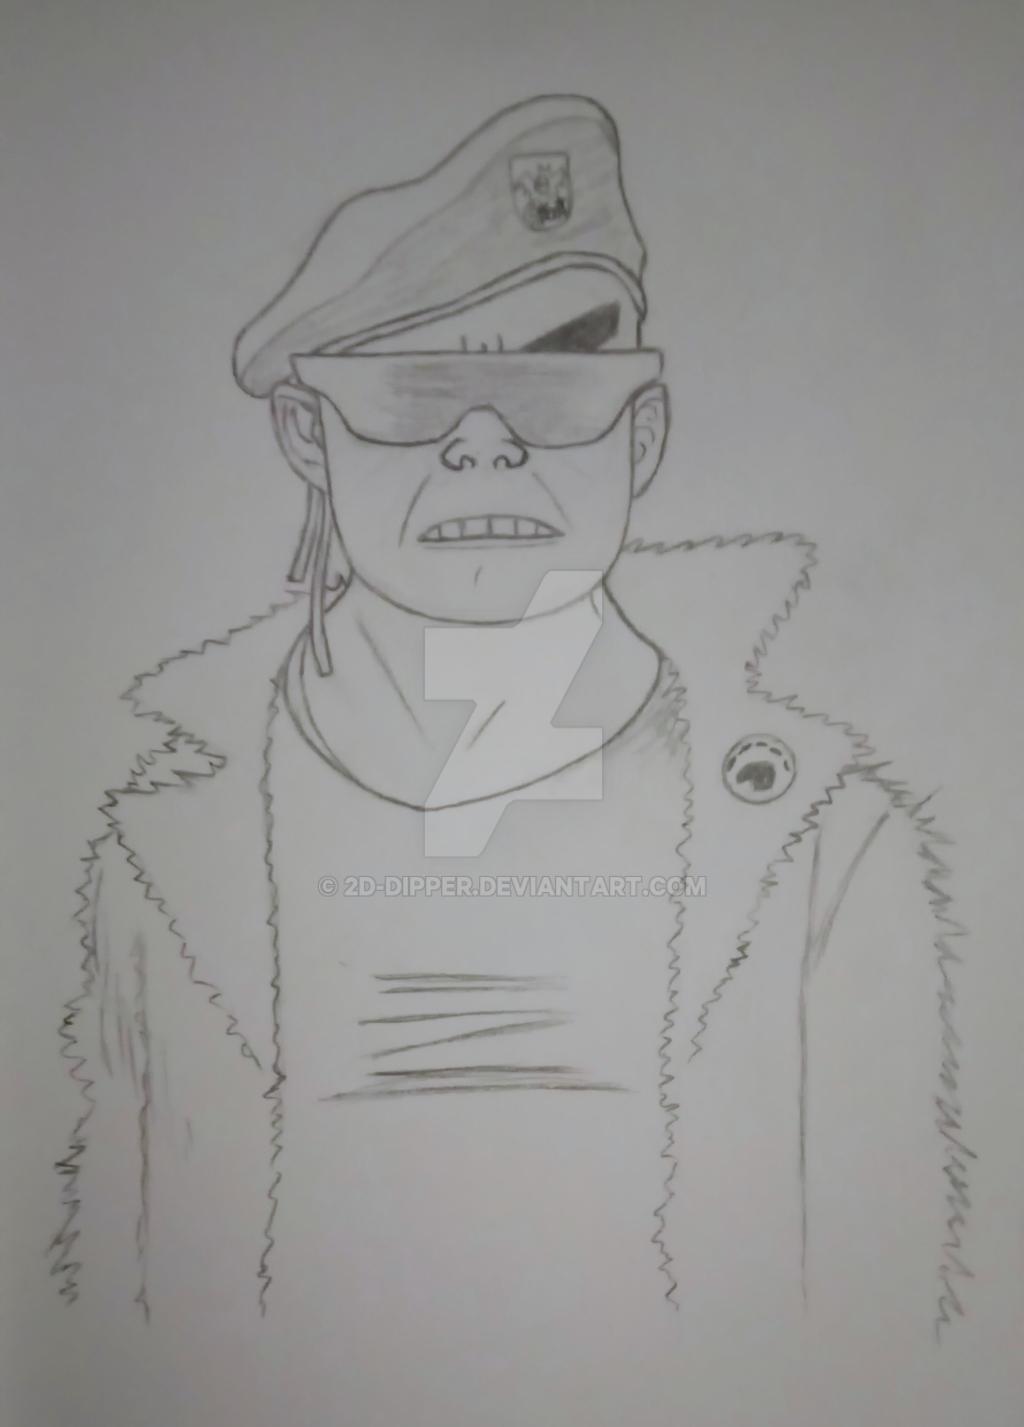 Russel hat [Sketch] by 2D-Dipper